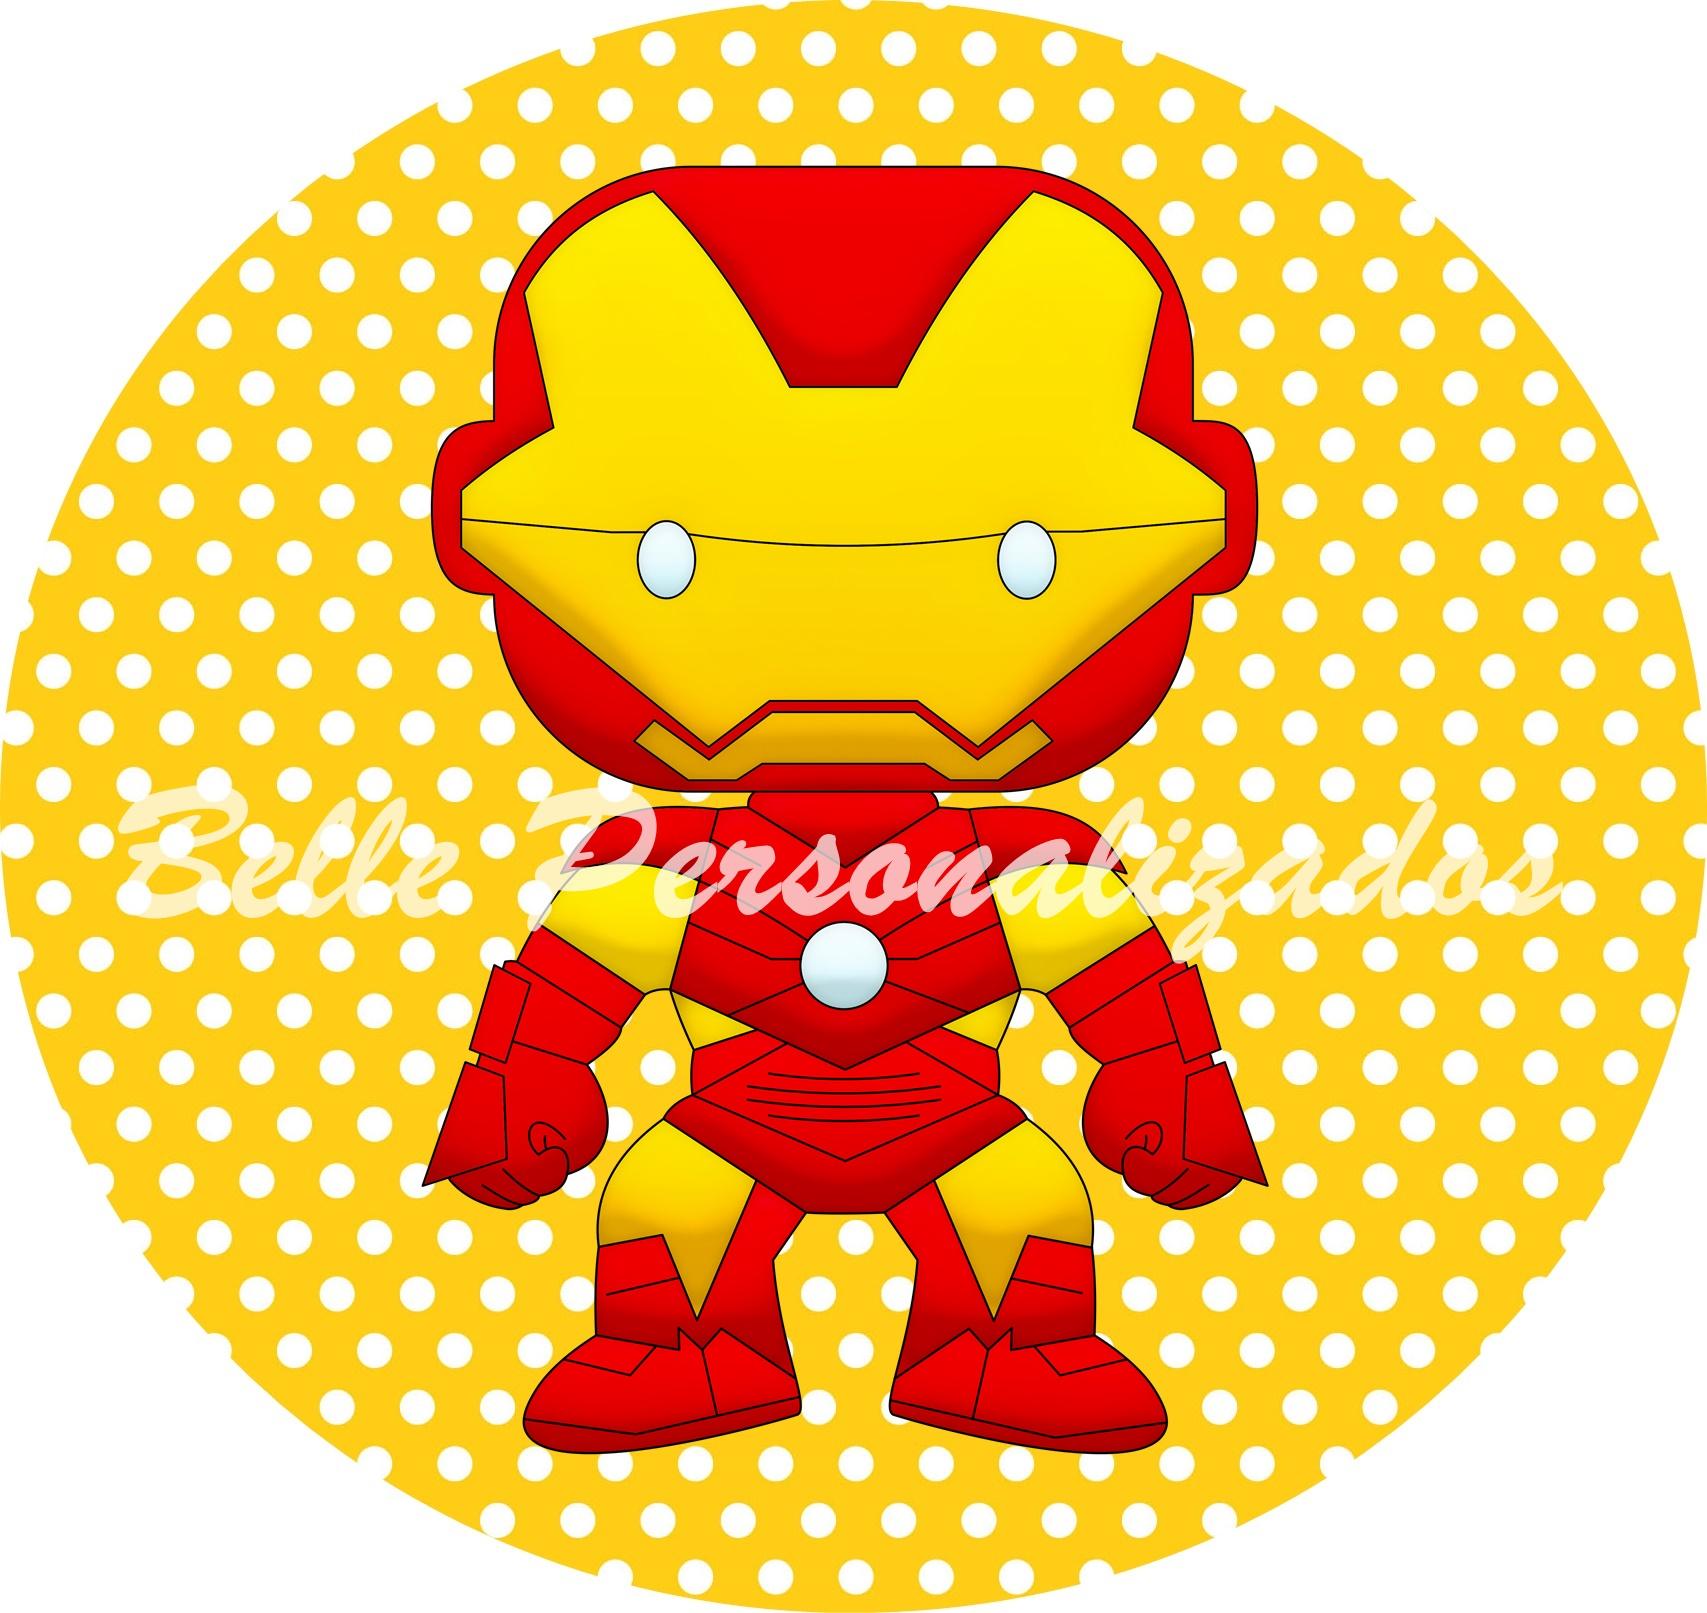 Como Conseguir Adesivo De Idoso ~ Adesivo Homem de Ferro Ateli u00ea Belle Personalizados Elo7